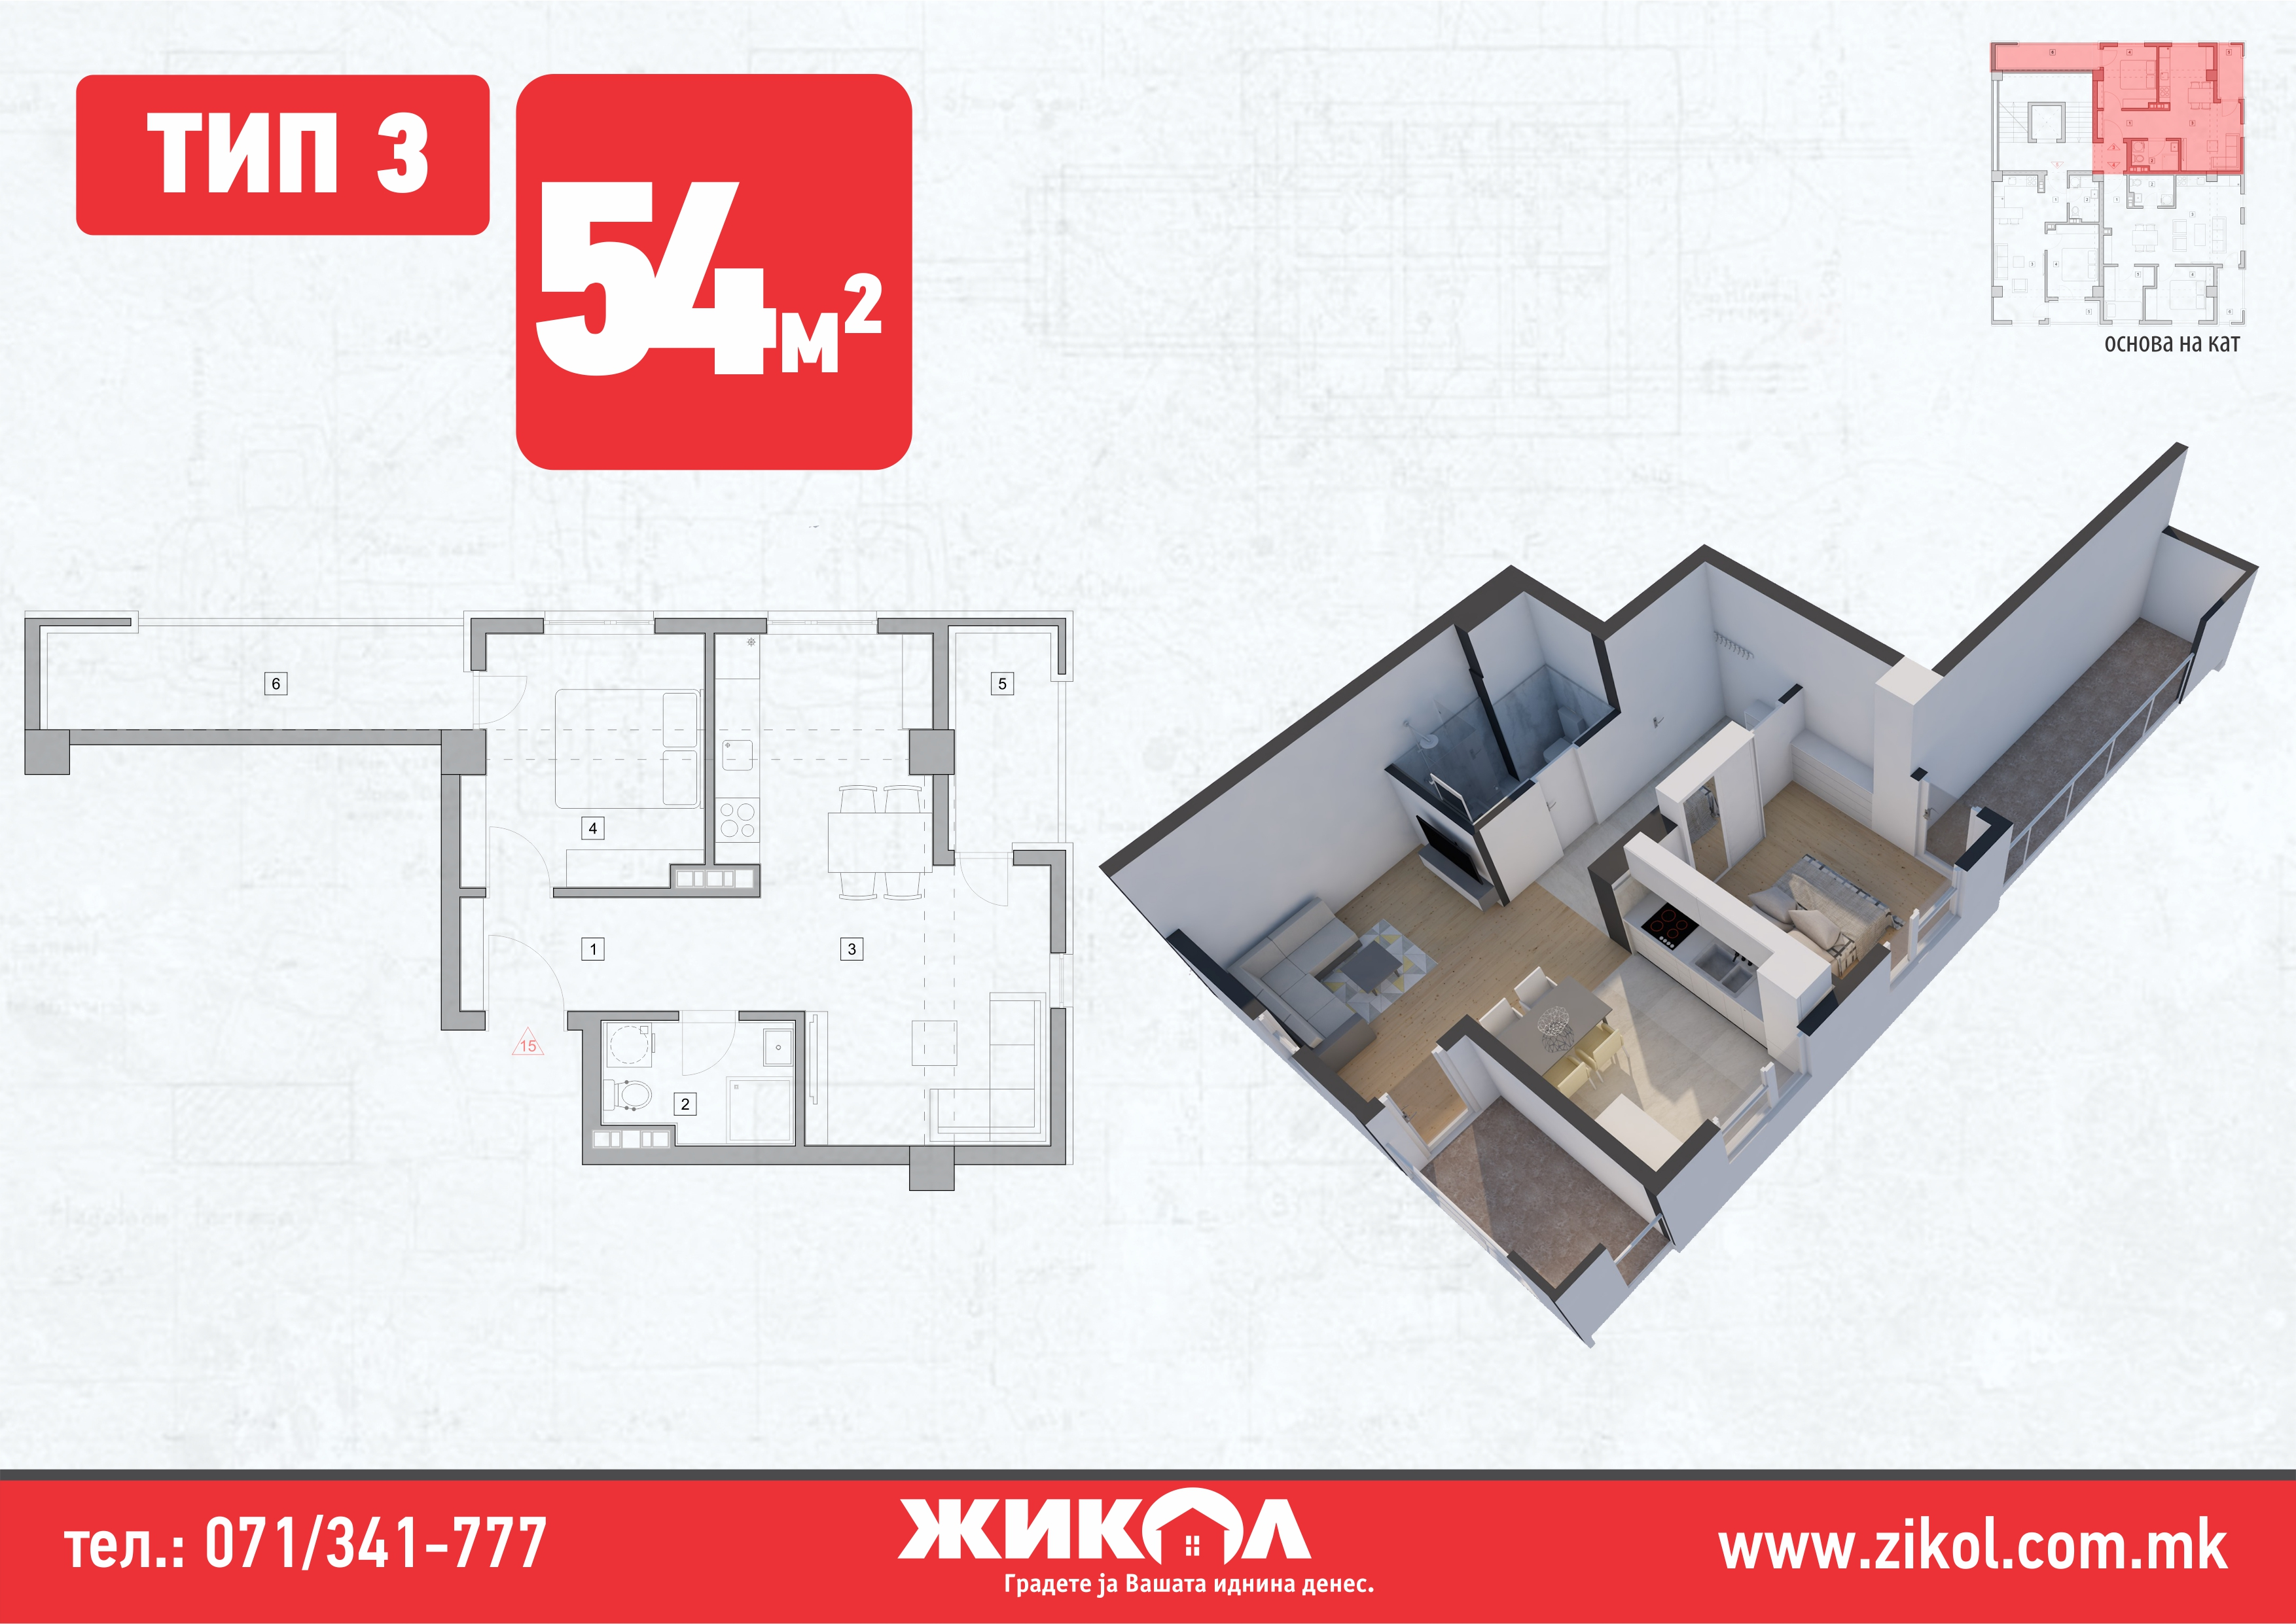 зграда 6, кат 1, стан 3